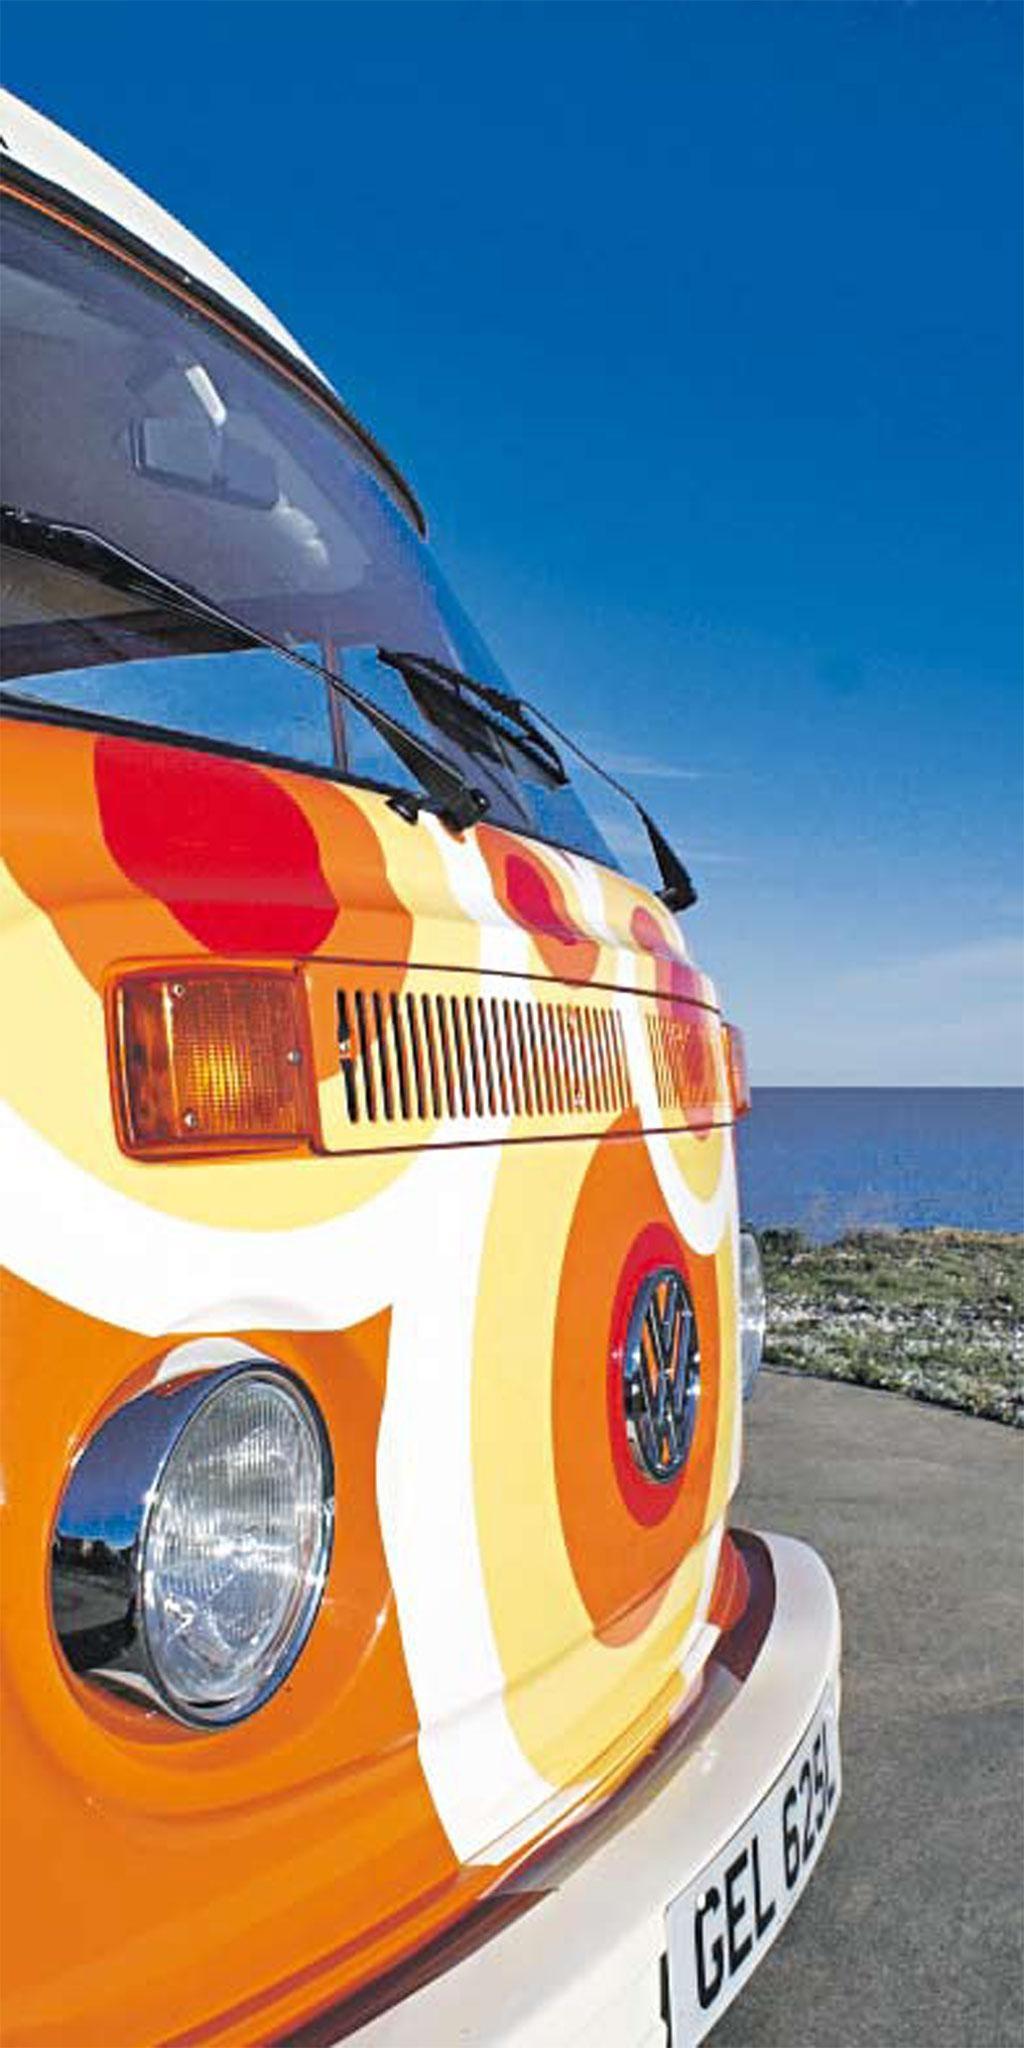 A stylish camper van fromWeDubYou